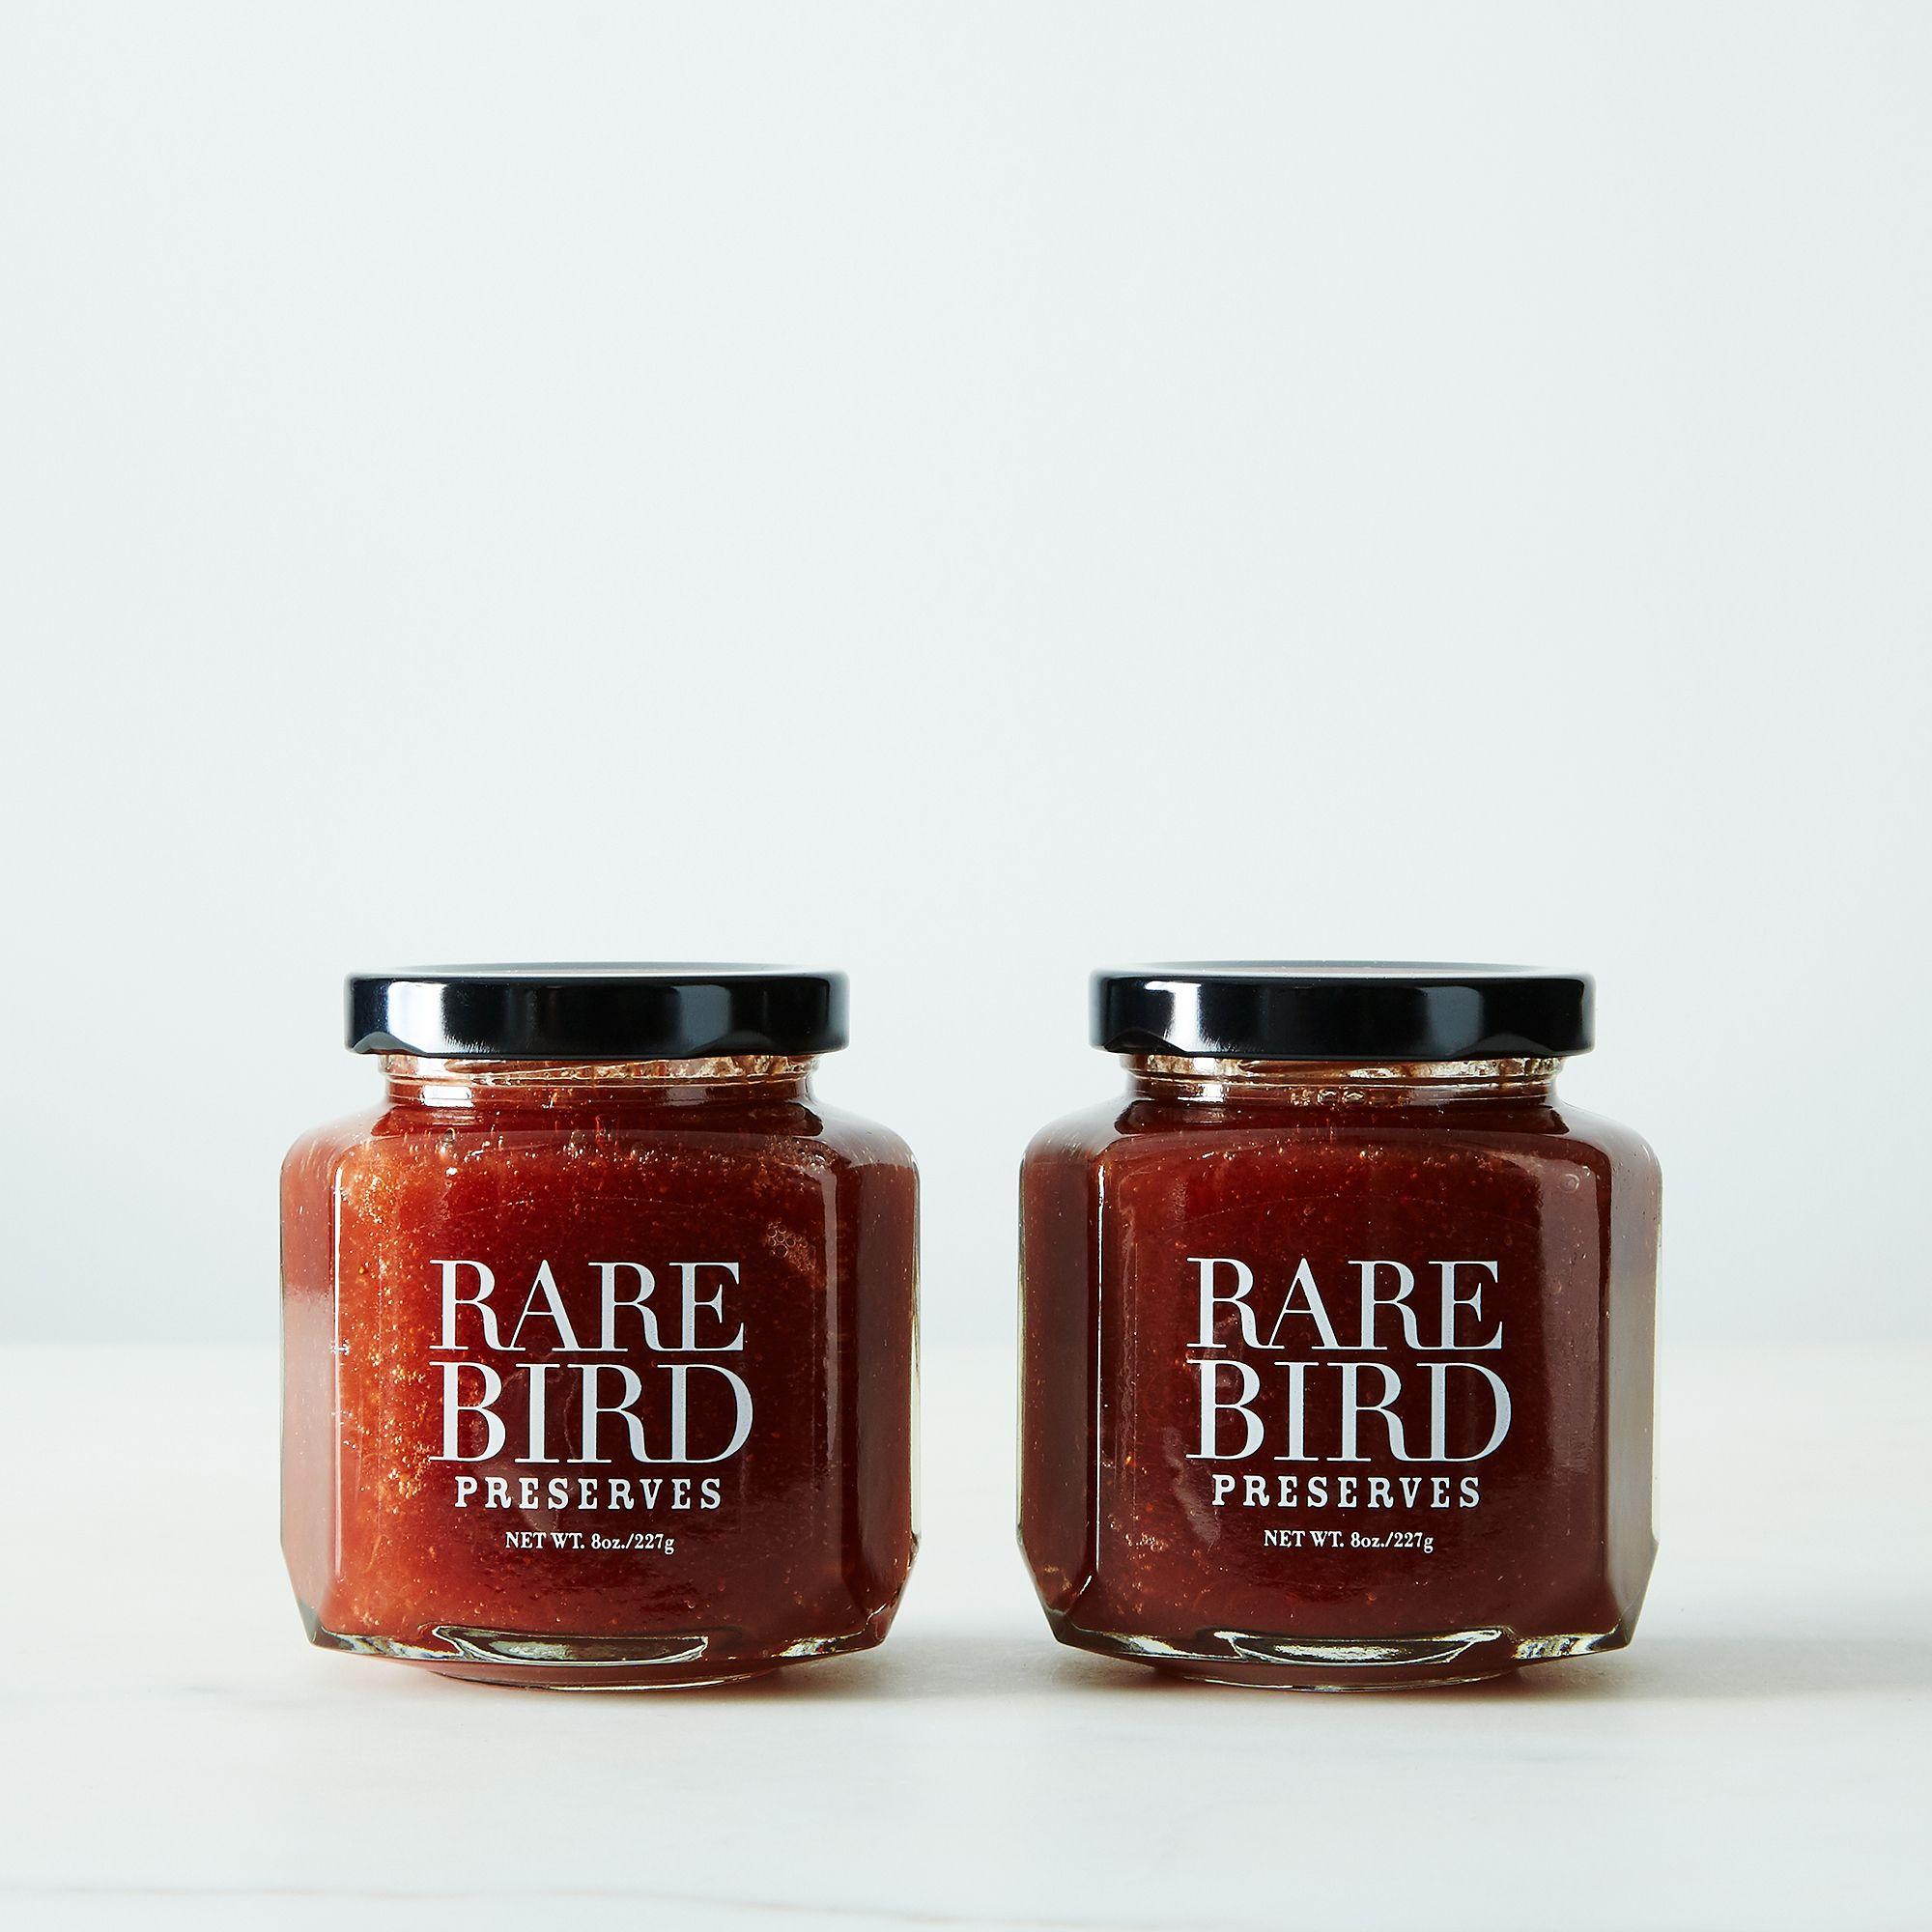 86505bad 3389 4408 ac39 4f658ccedb12  2015 0316 rare bird preserves strawberry rhubarb preservers silo 012